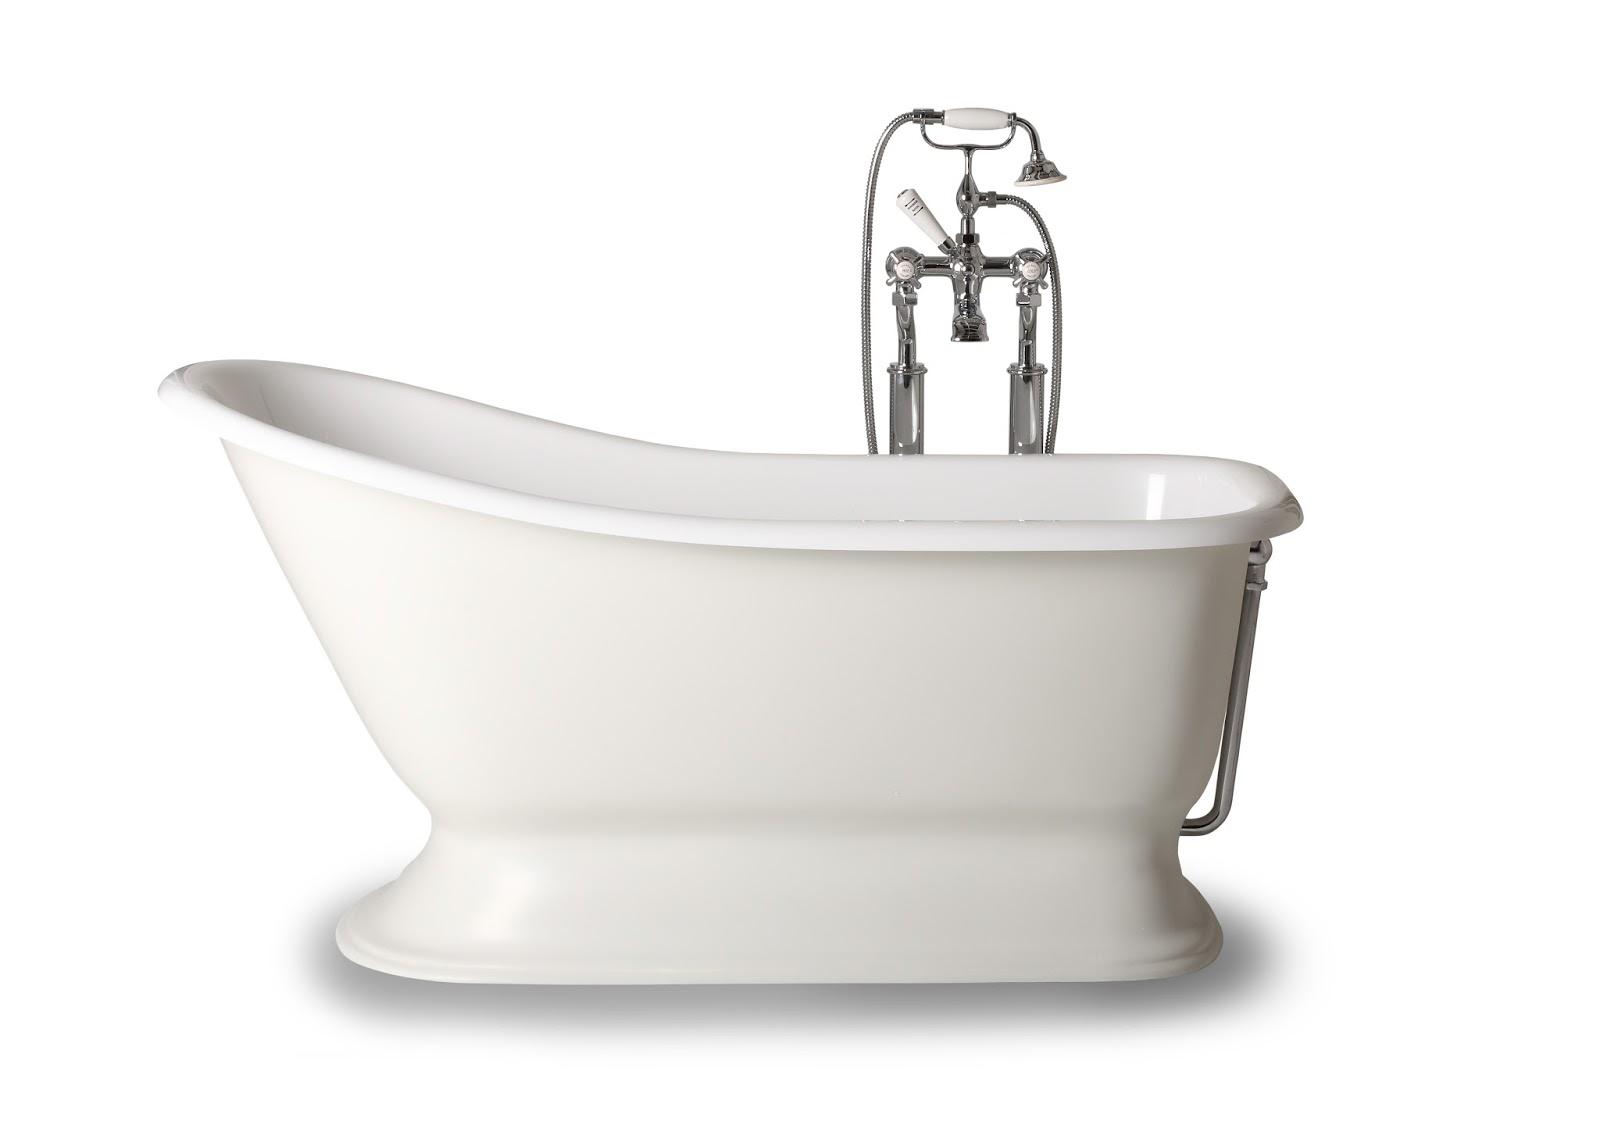 The Albion Bath Company Ltd Neptune Advance Bath Tub